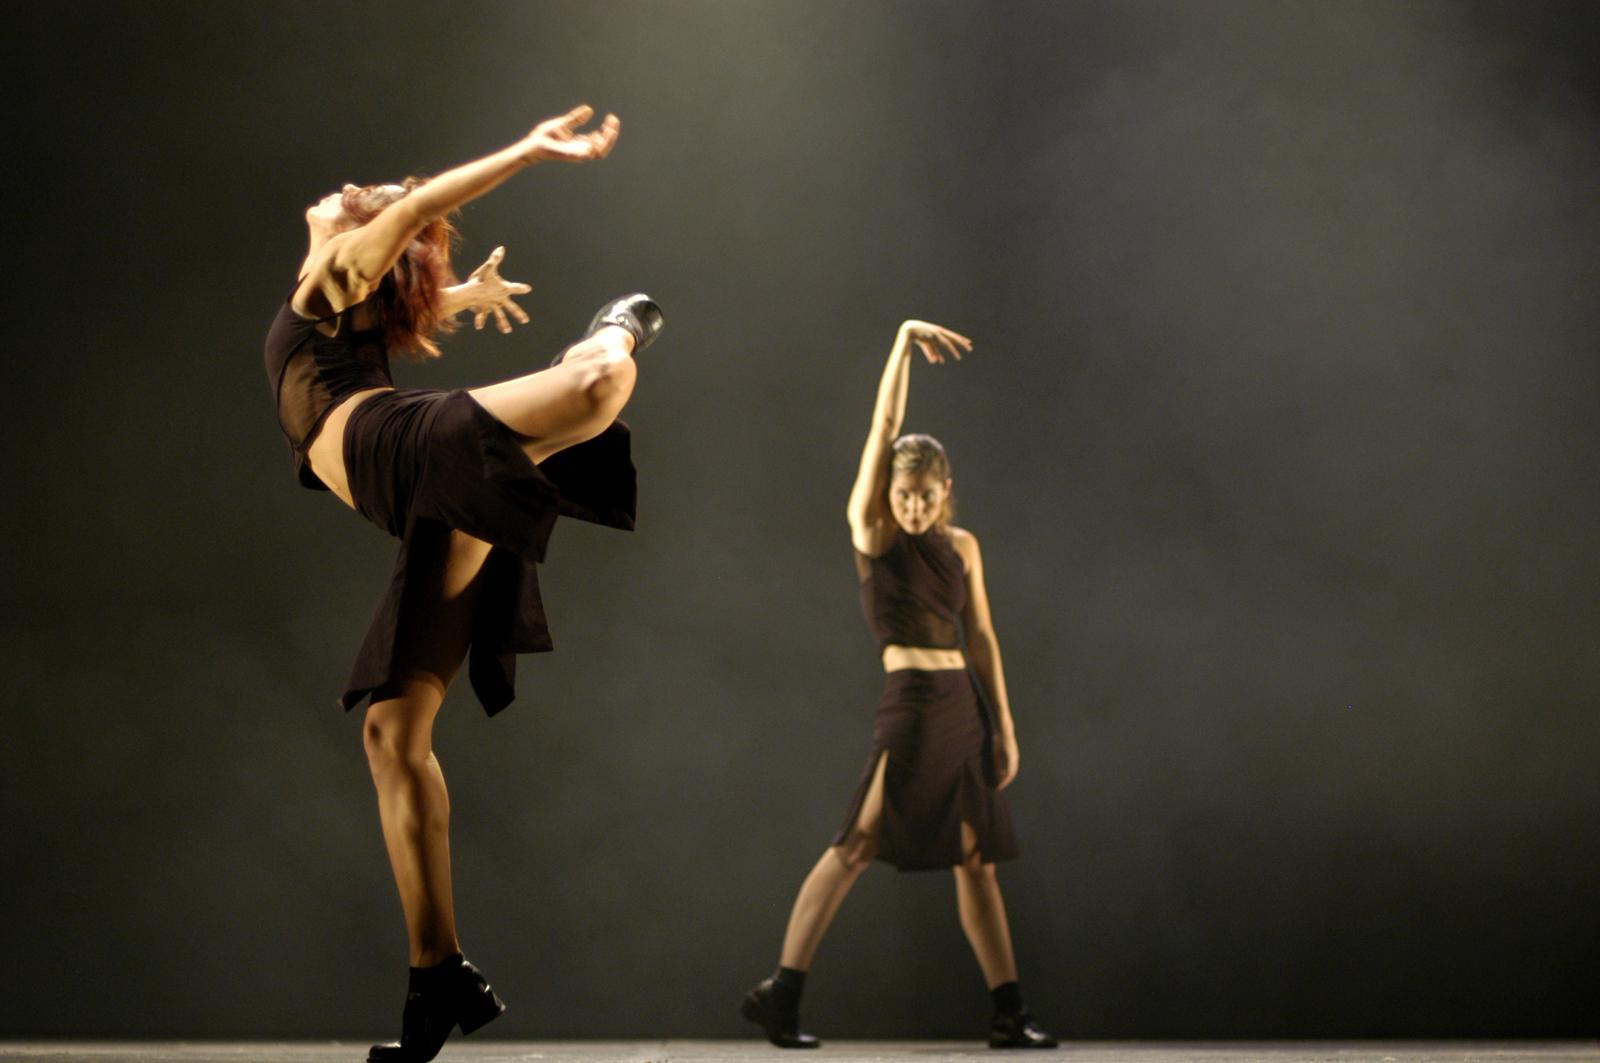 Danza contemporanea danza pasion danza modernas la danza for Imagenes de epoca contemporanea